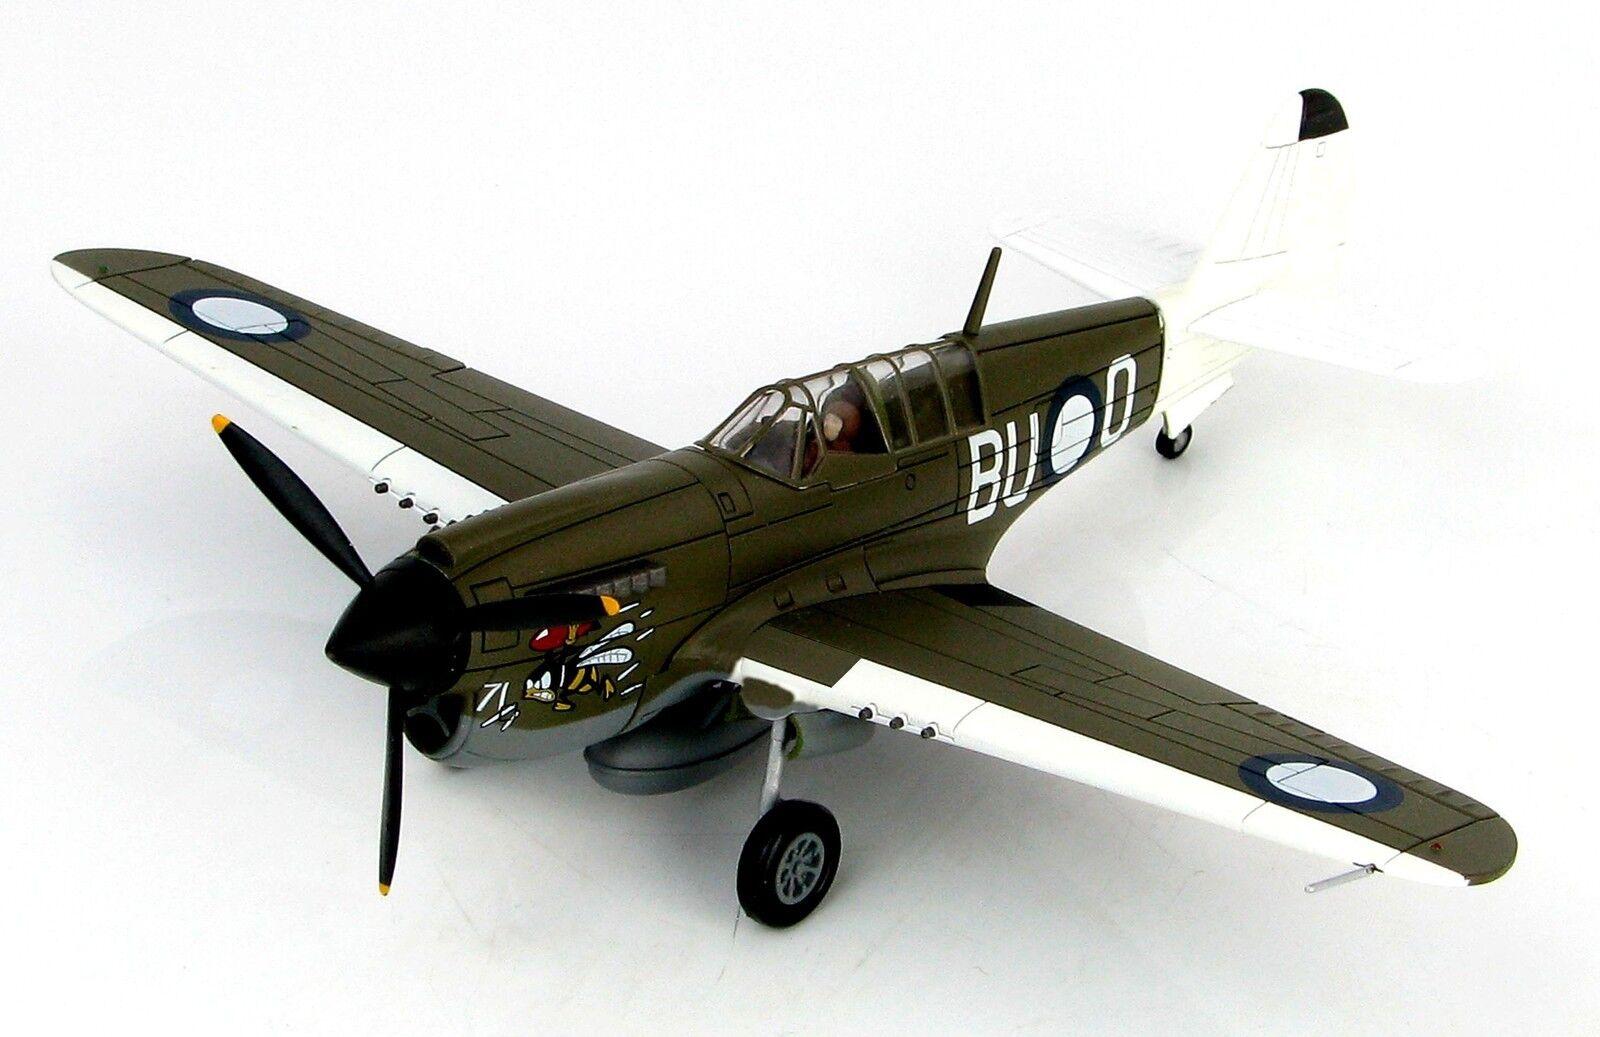 Hobby Master 1:72 RAAF Curtiss P-40N Warhawk Fighter,  HA5505